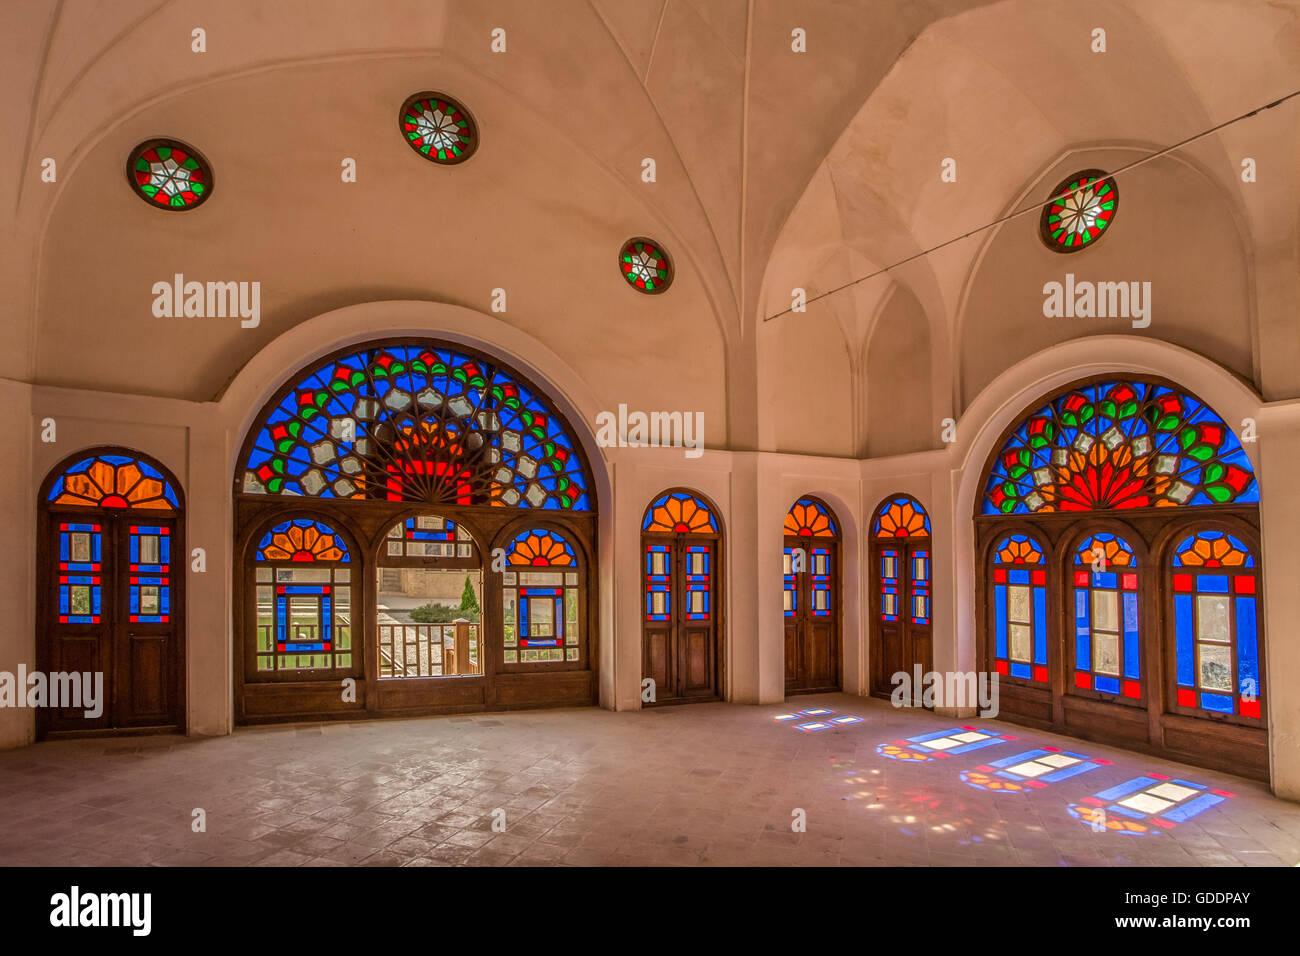 Iran,Kashan City,Near Alavi Street,Traditional Tabatabei House - Stock Image